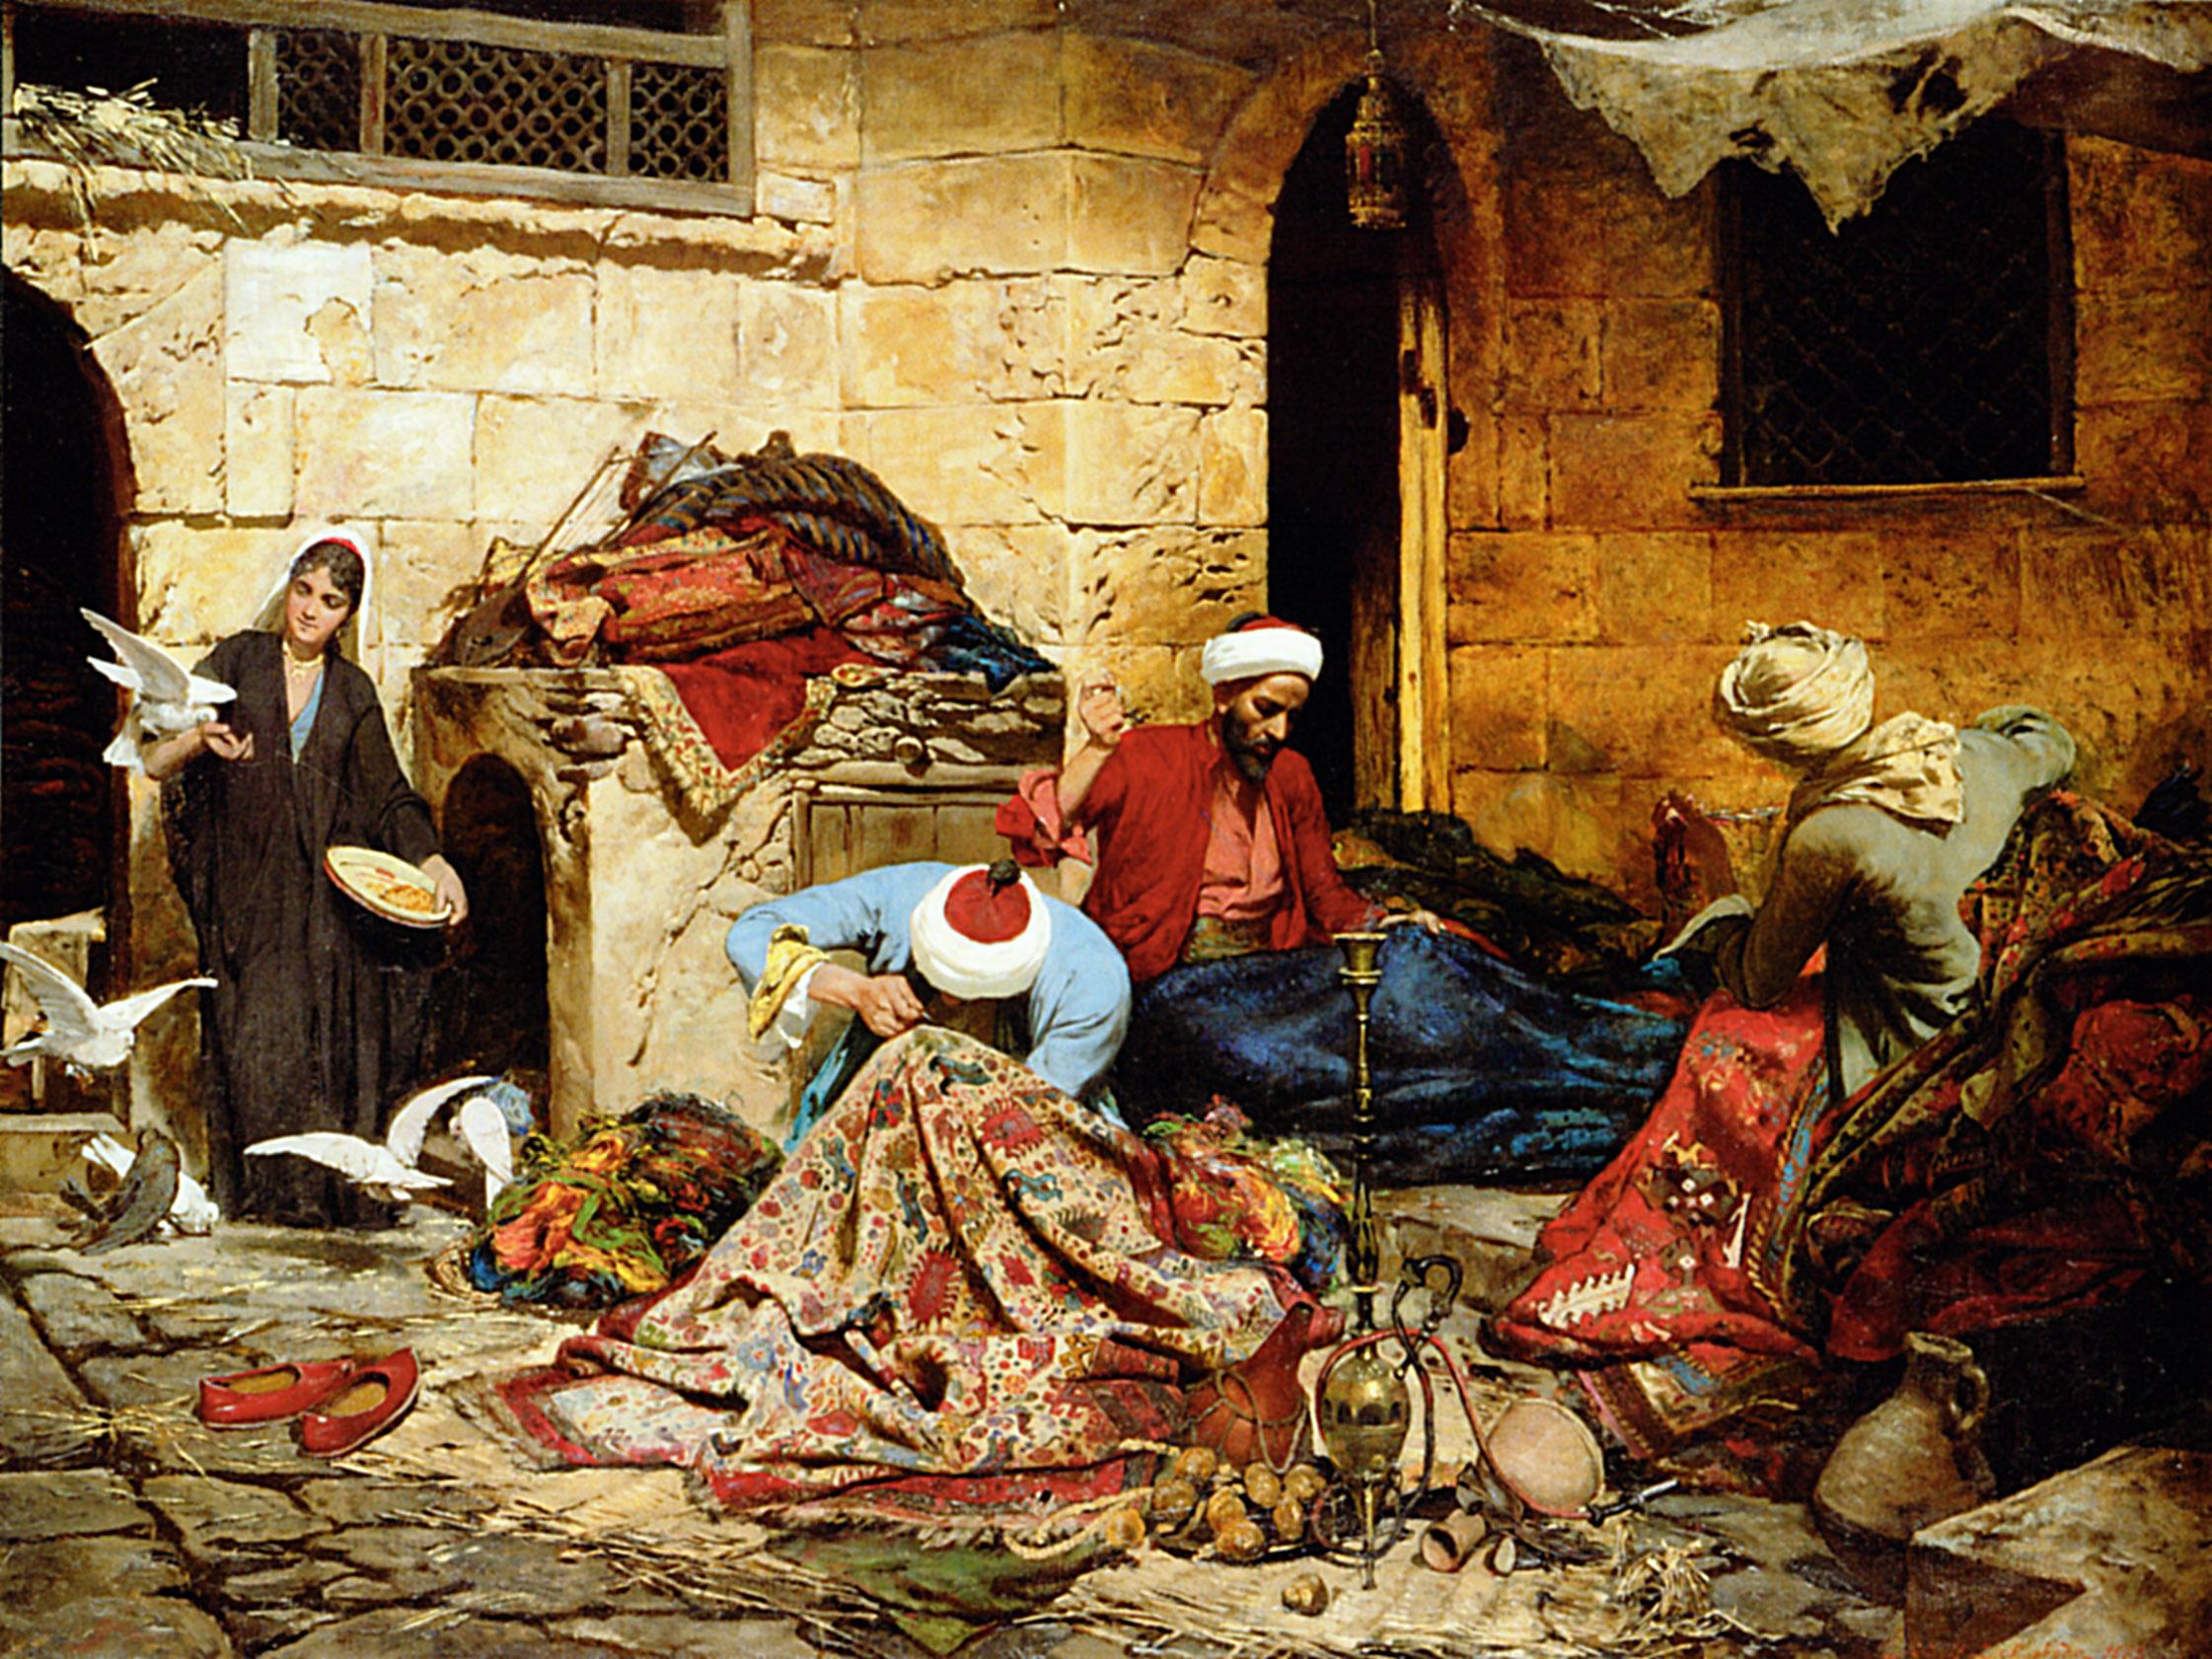 Orientalizm onok art sayfa 13 for Making prints of paintings